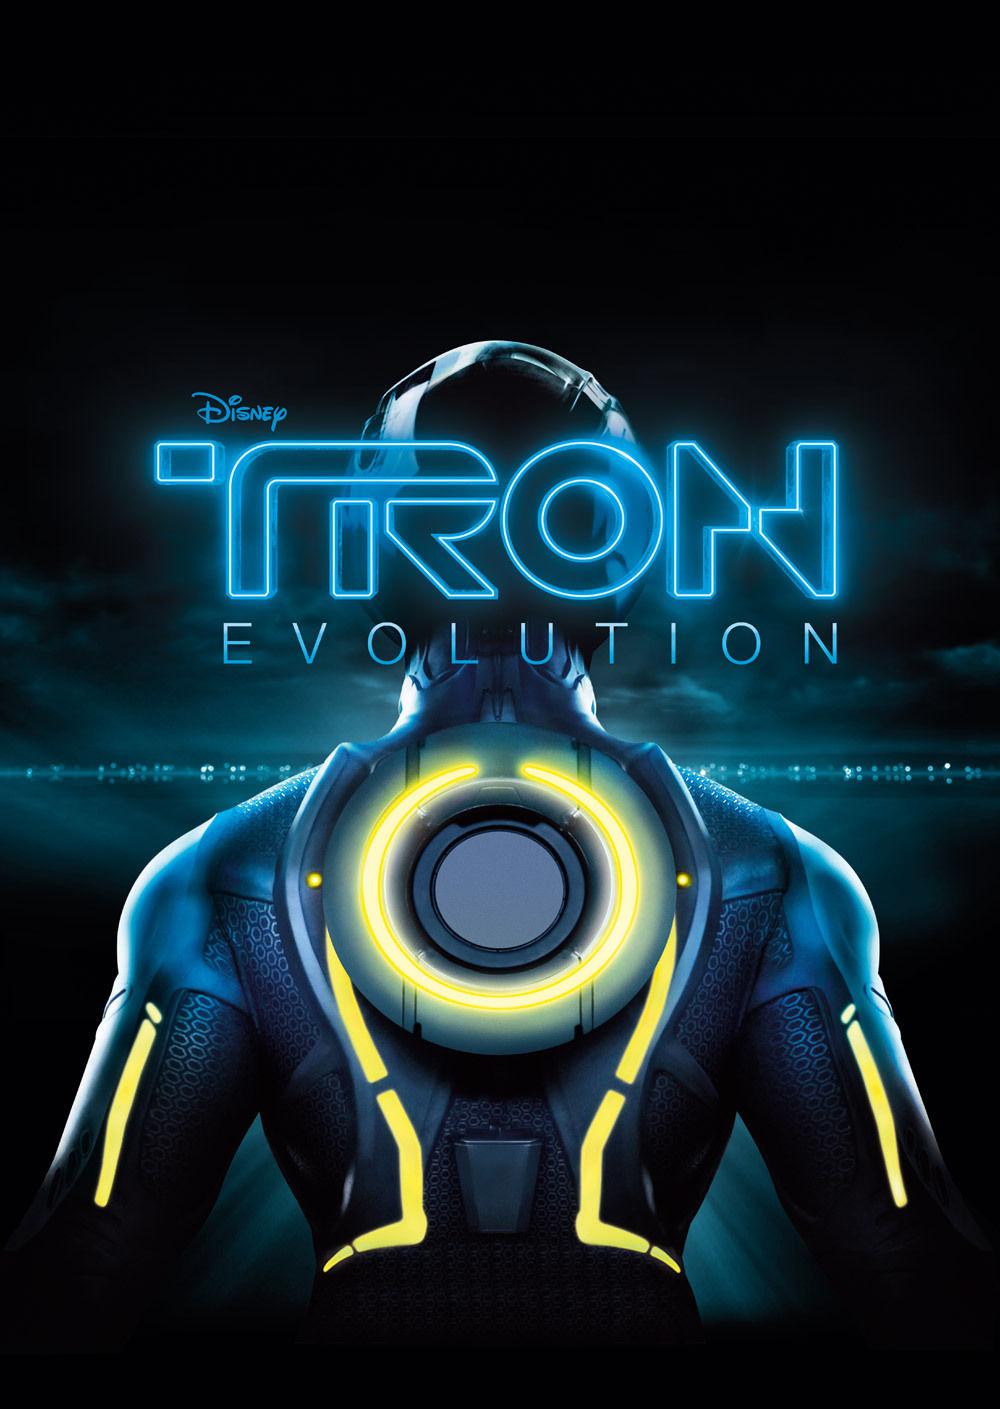 Tron: Evolution Backgrounds on Wallpapers Vista